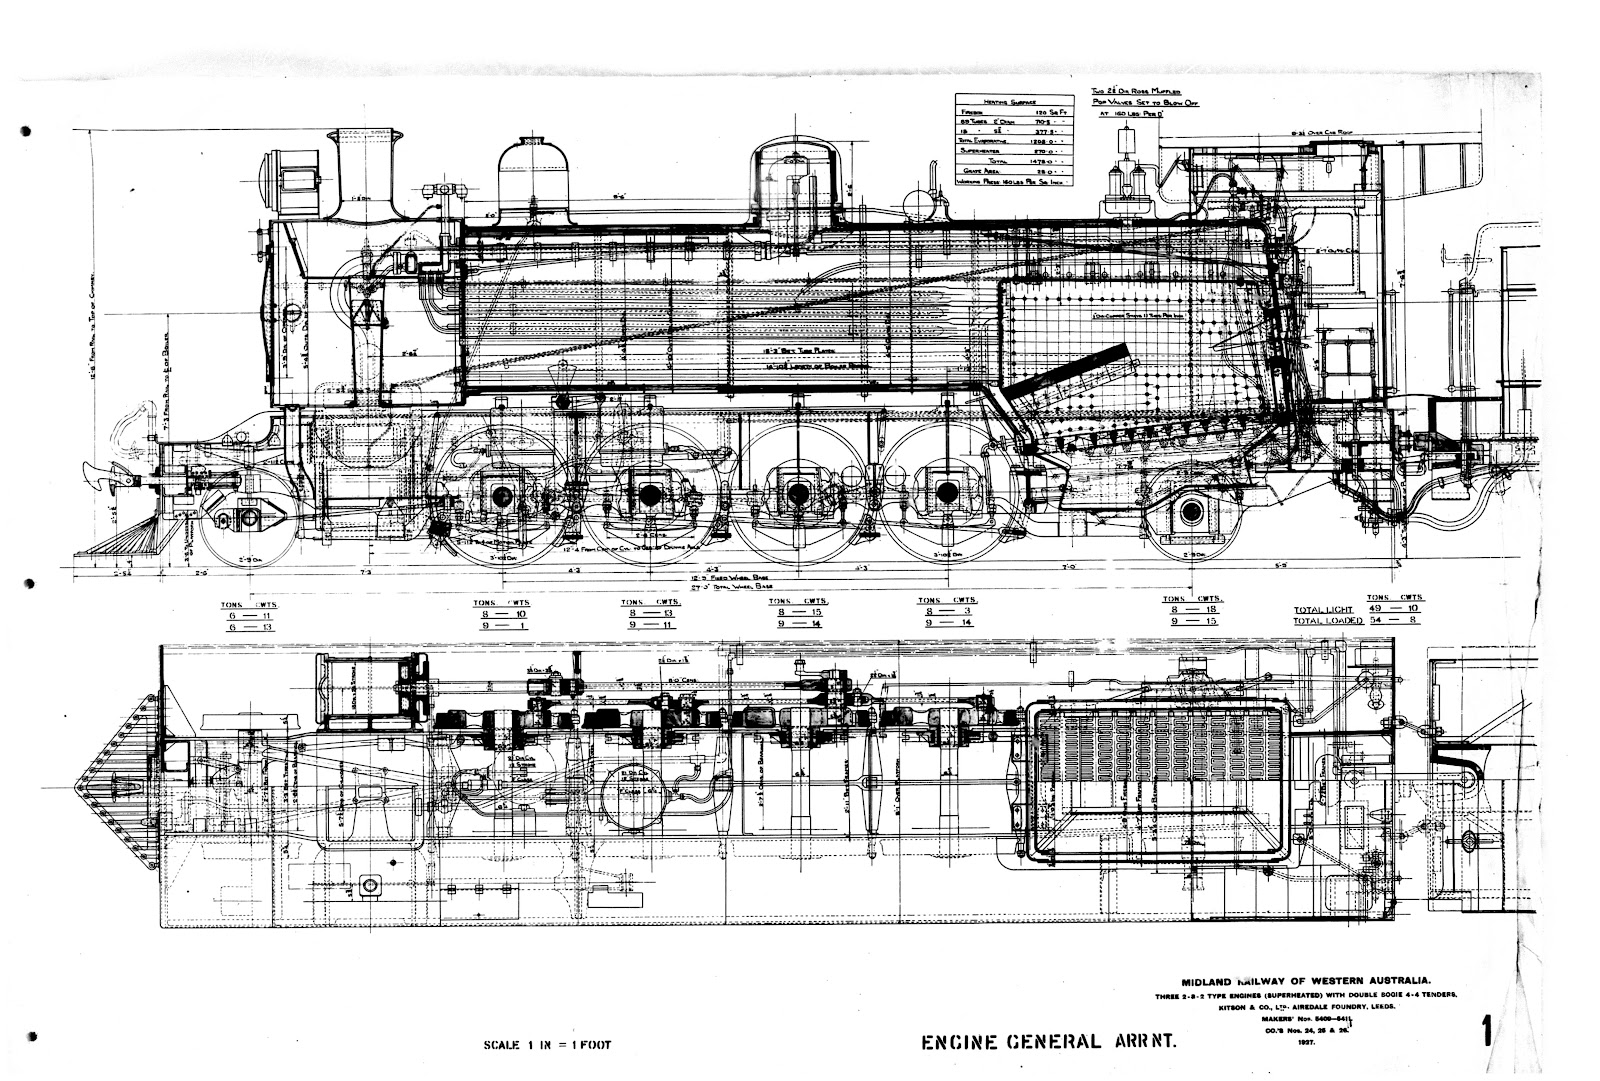 wa sn3 models the mrwa a class steam locomotive wa sn3 models [ 1600 x 1081 Pixel ]